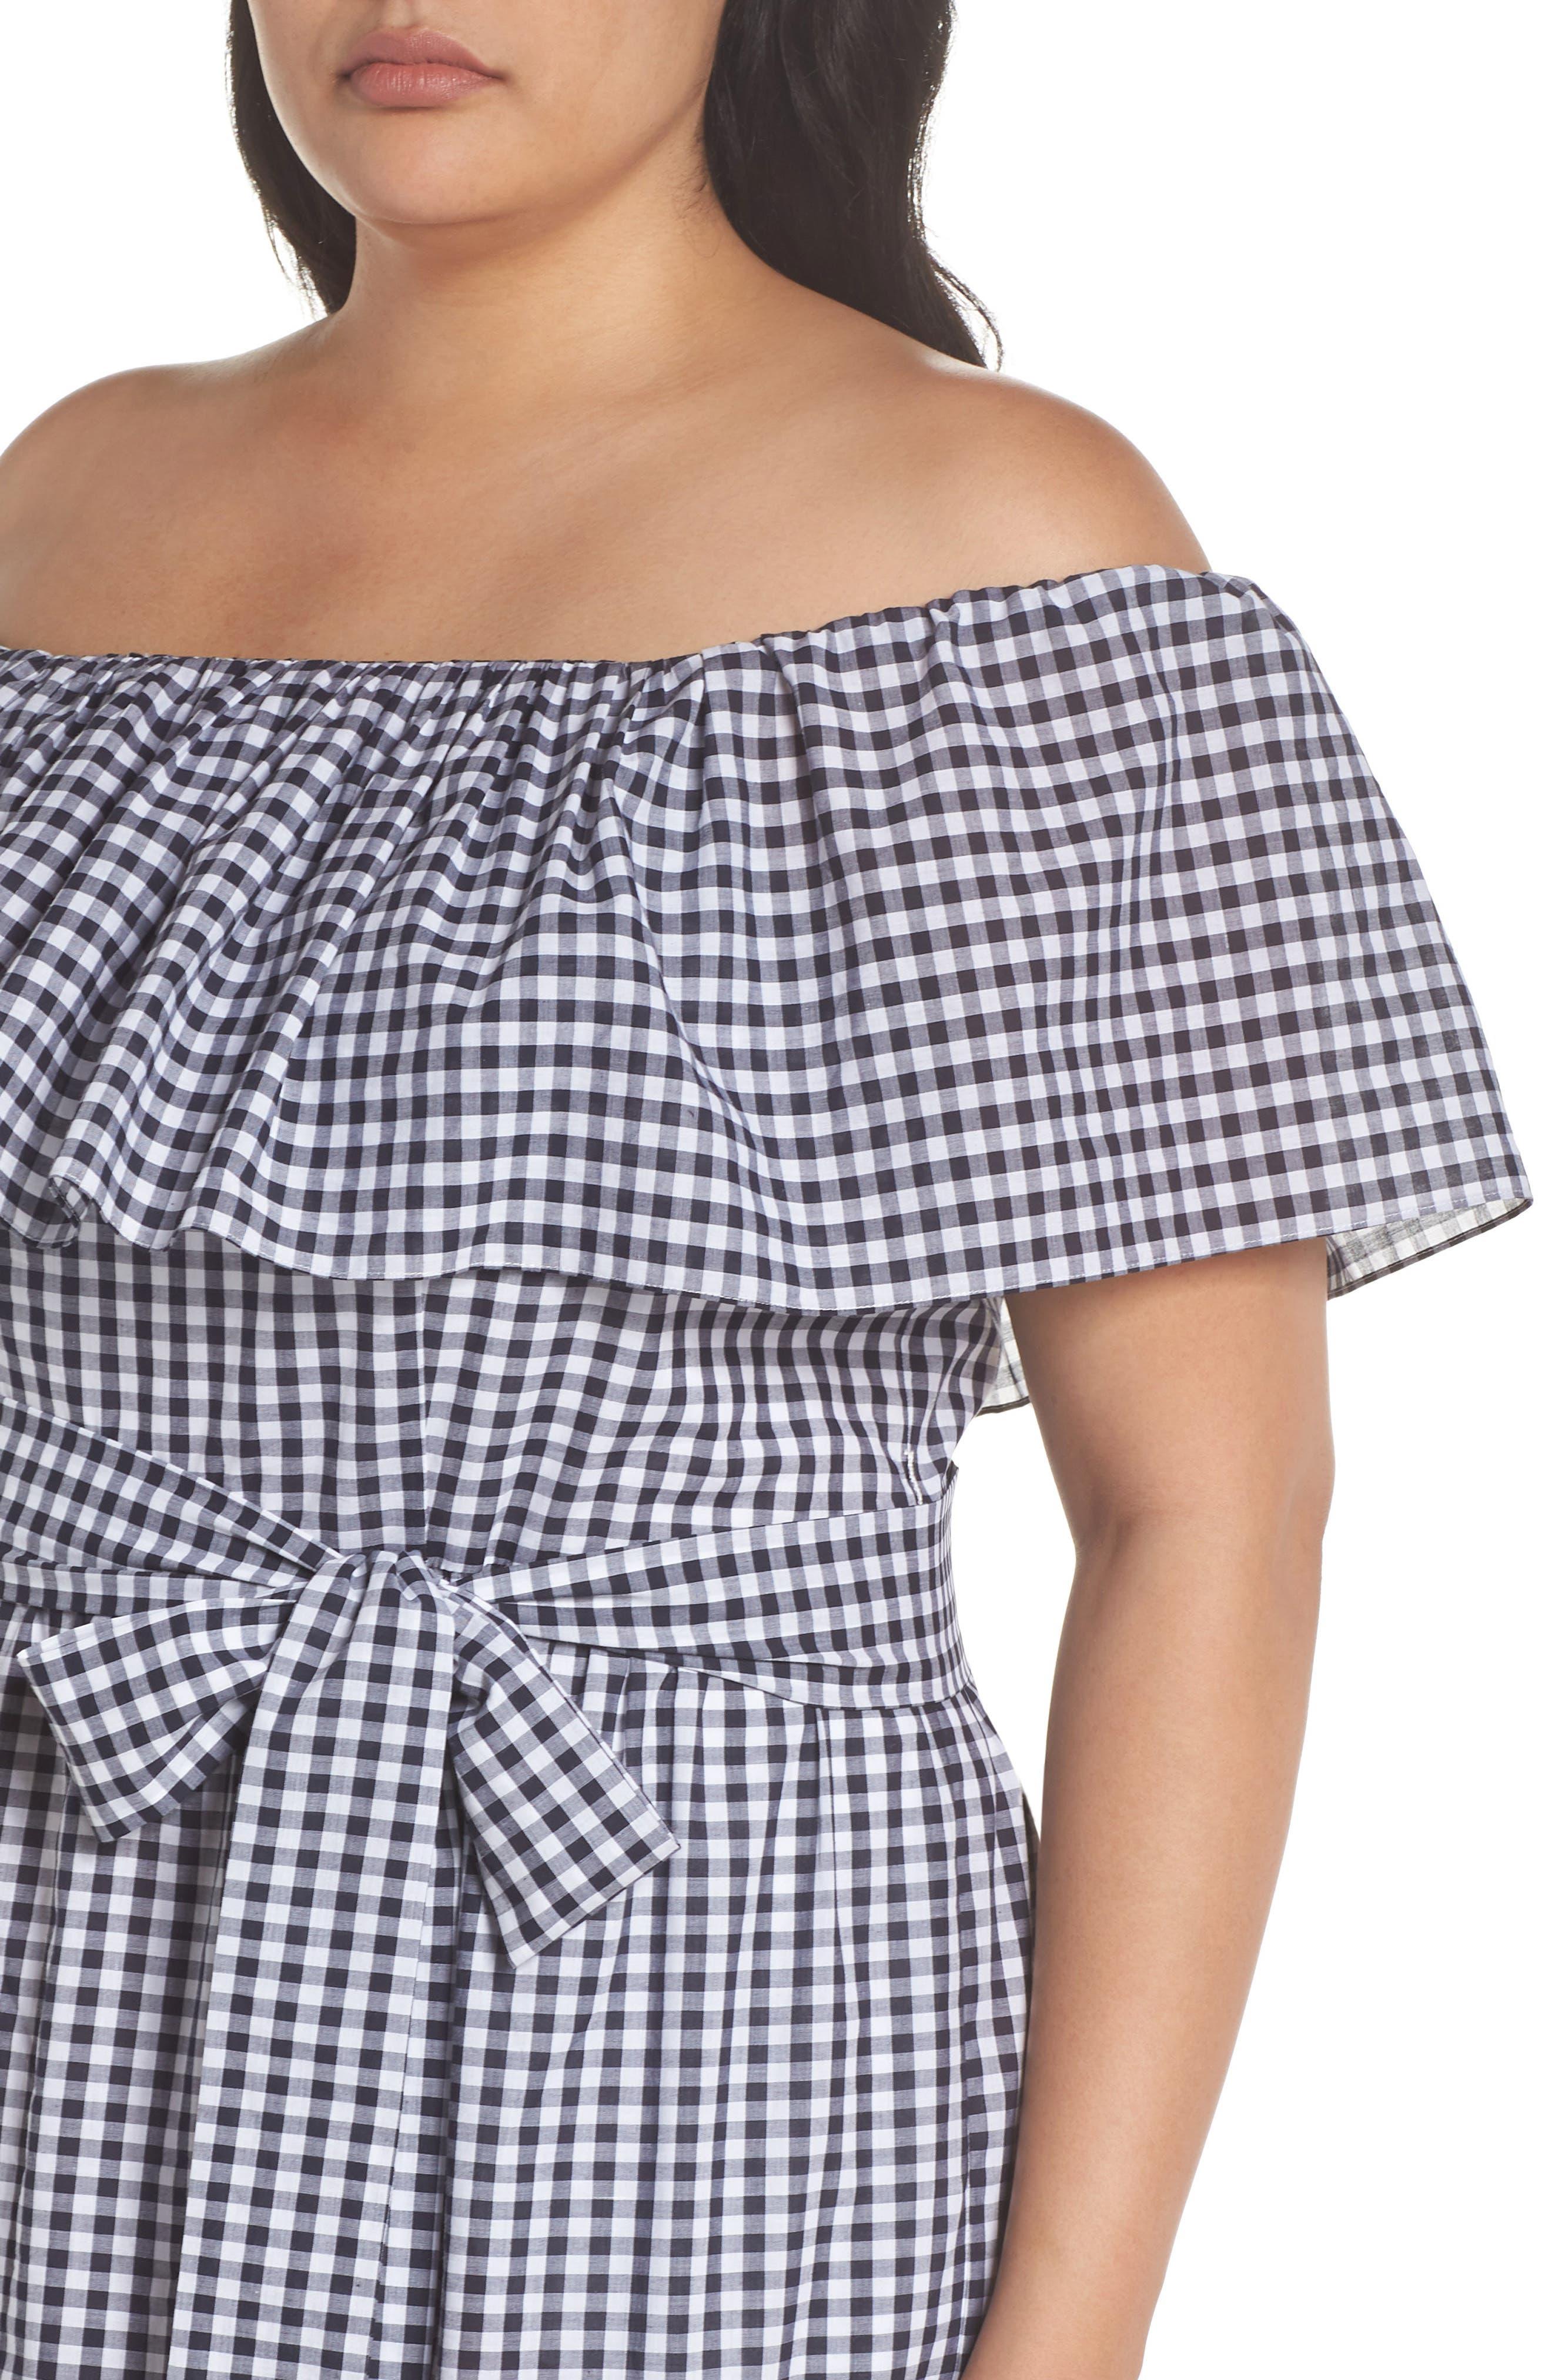 Off the Shoulder Gingham Maxi Dress,                             Alternate thumbnail 4, color,                             Blue White Gingham